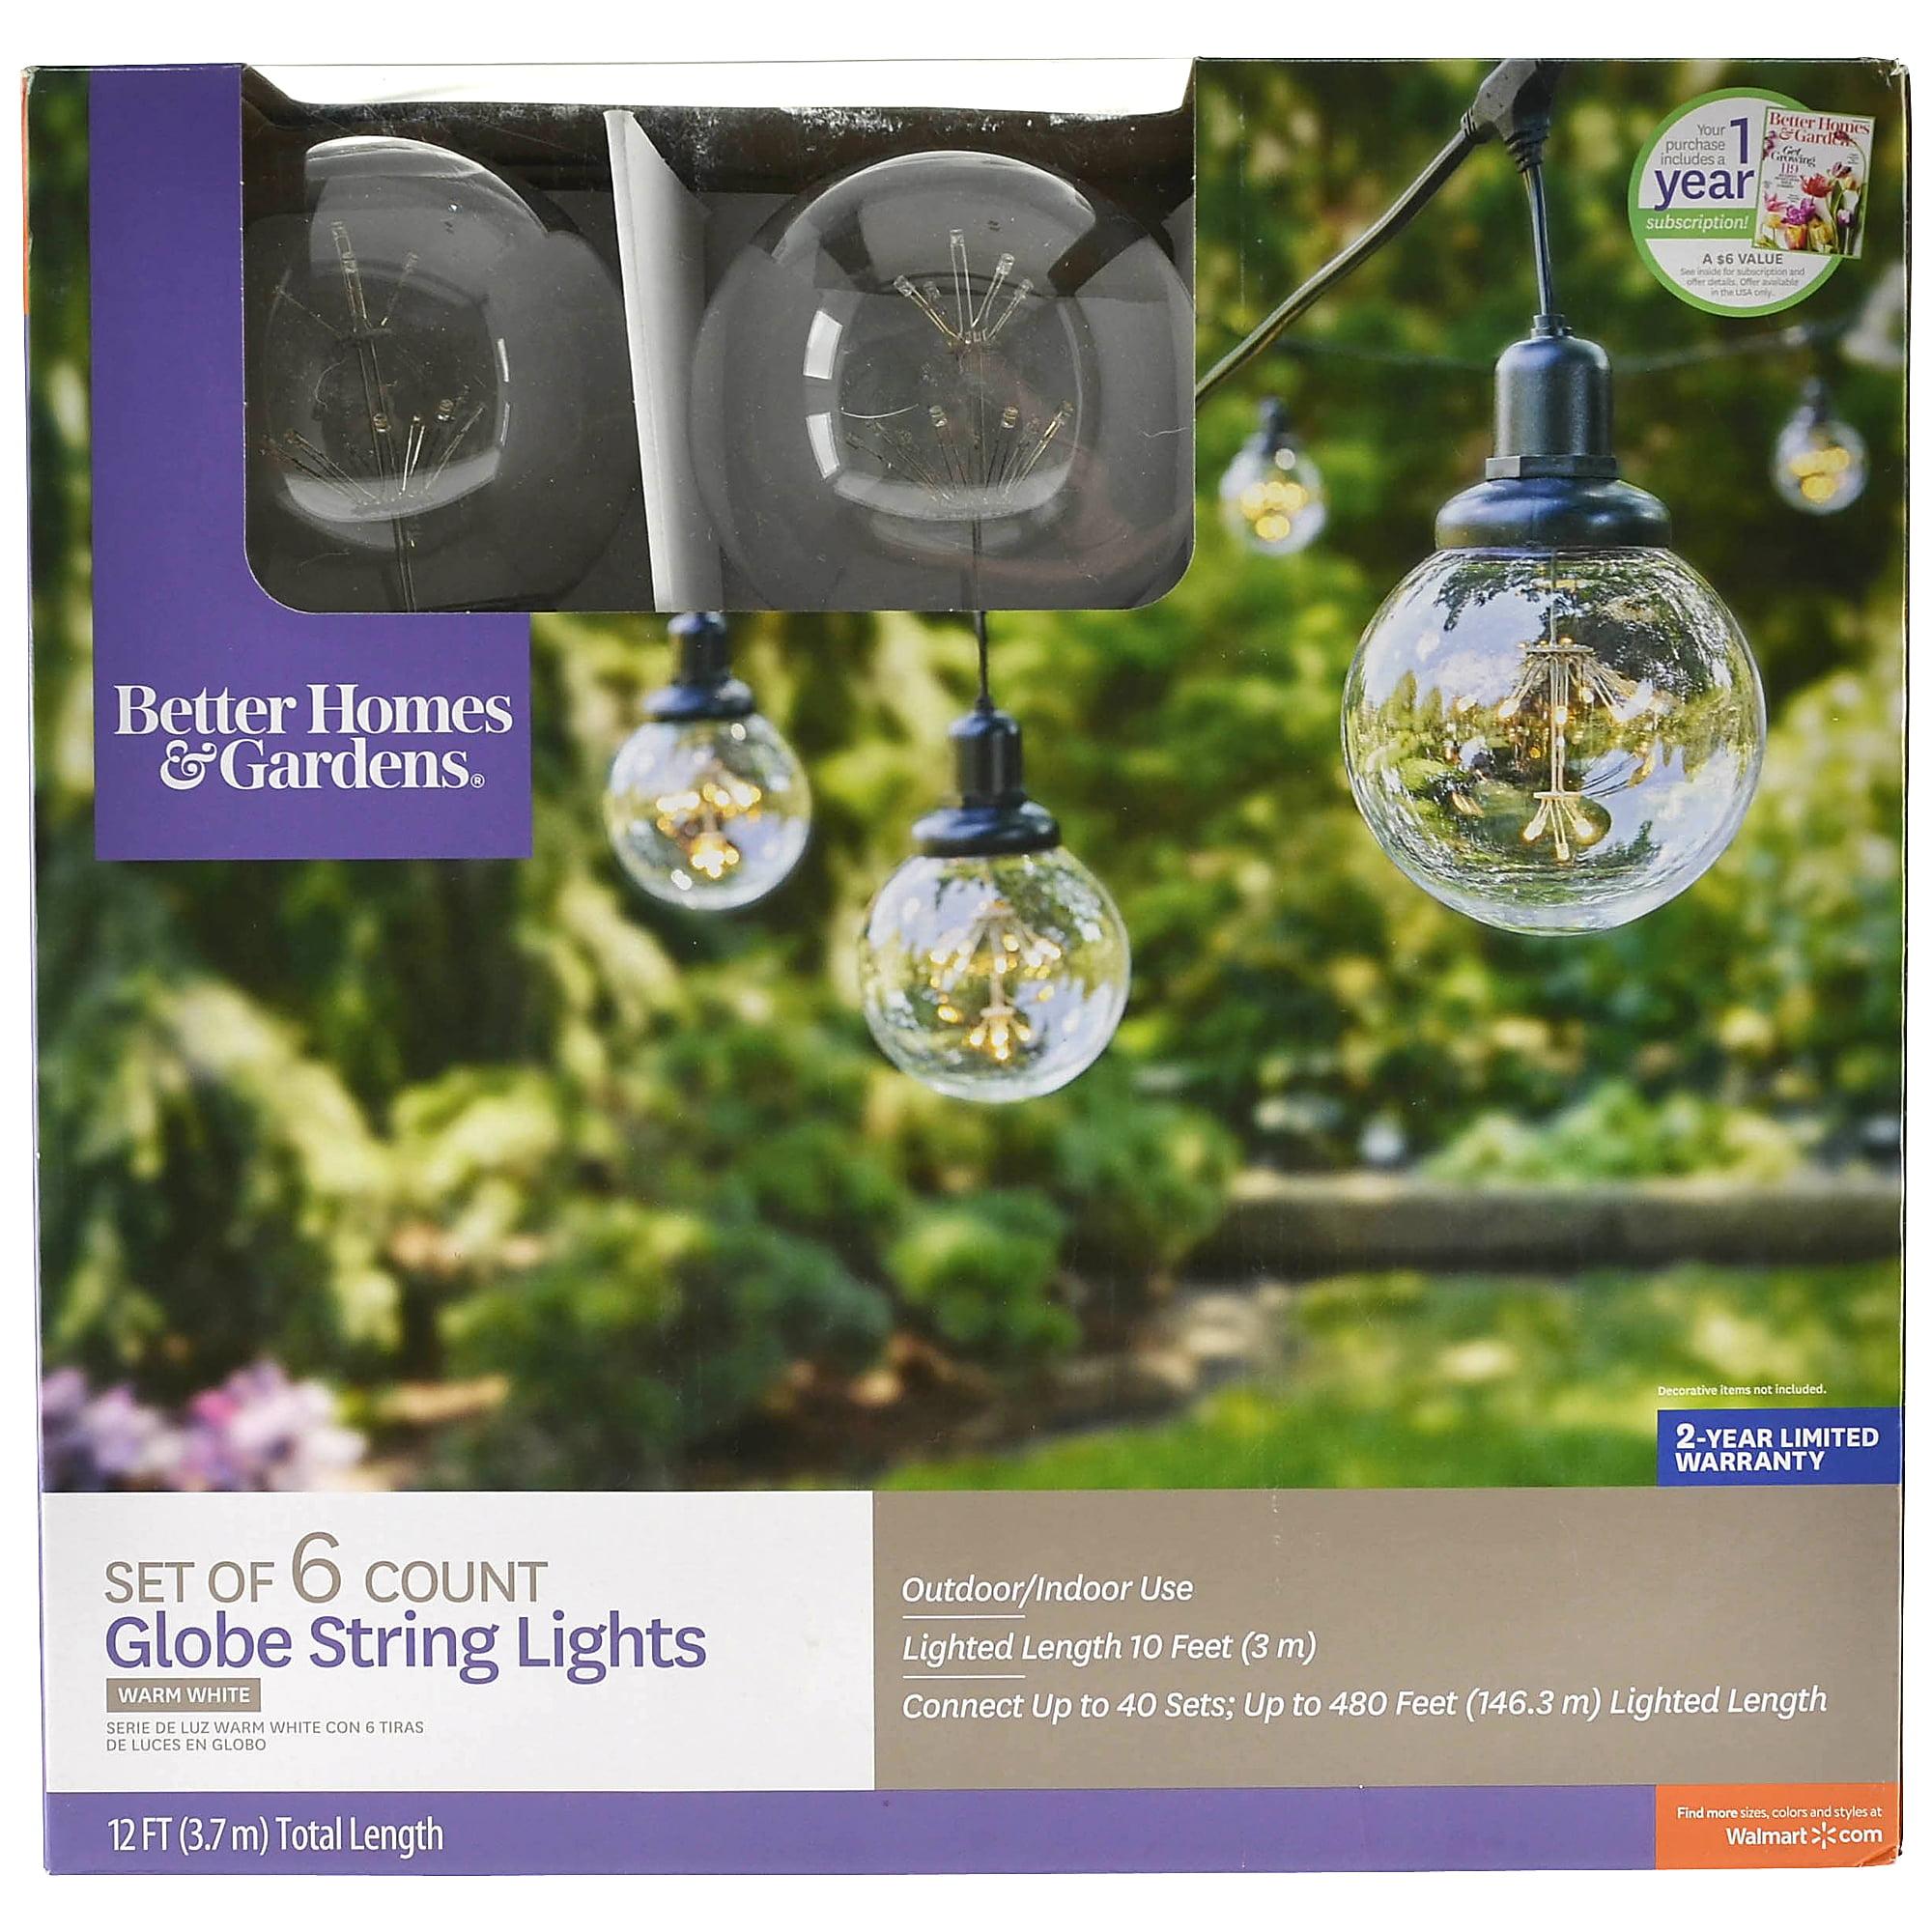 Better Homes & Gardens Bhg 6 Count Led Xl Globe String Lights by Better Homes & Gardens